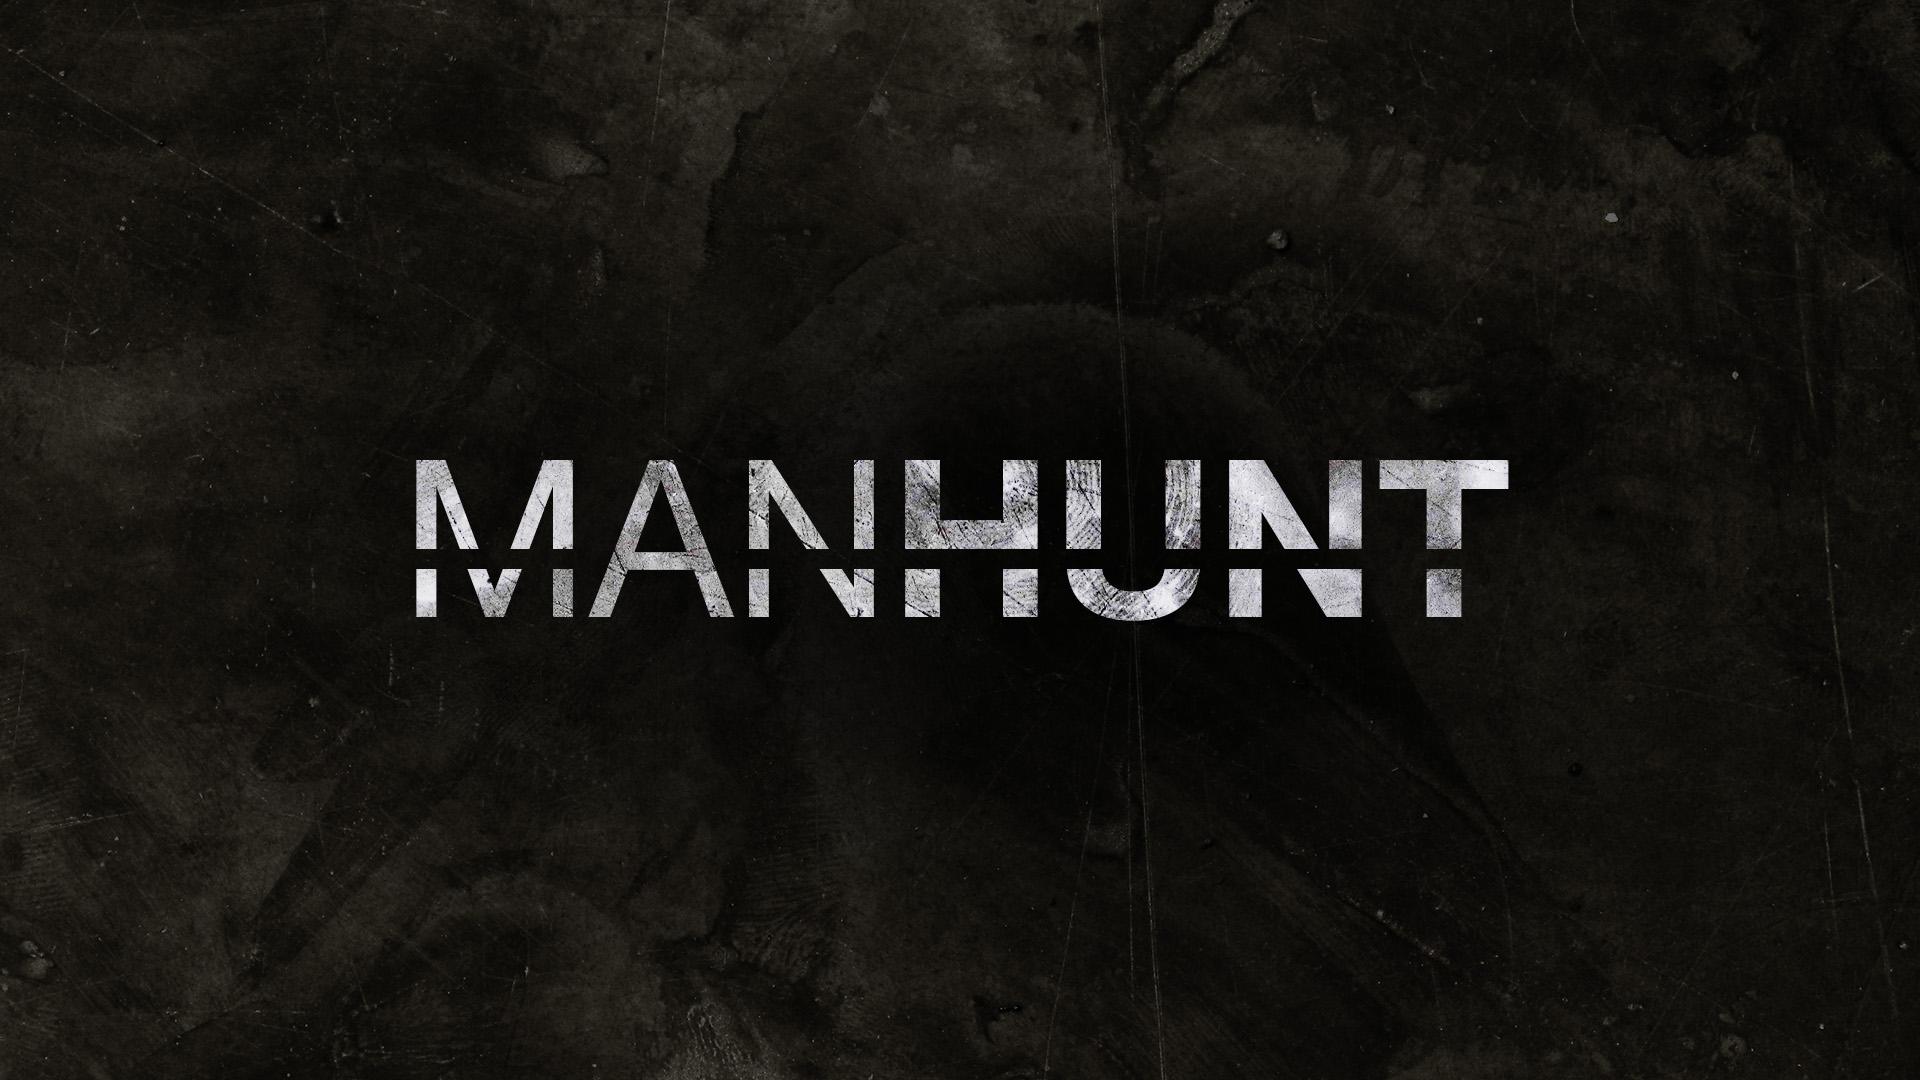 xManhunt_V2_2.jpg